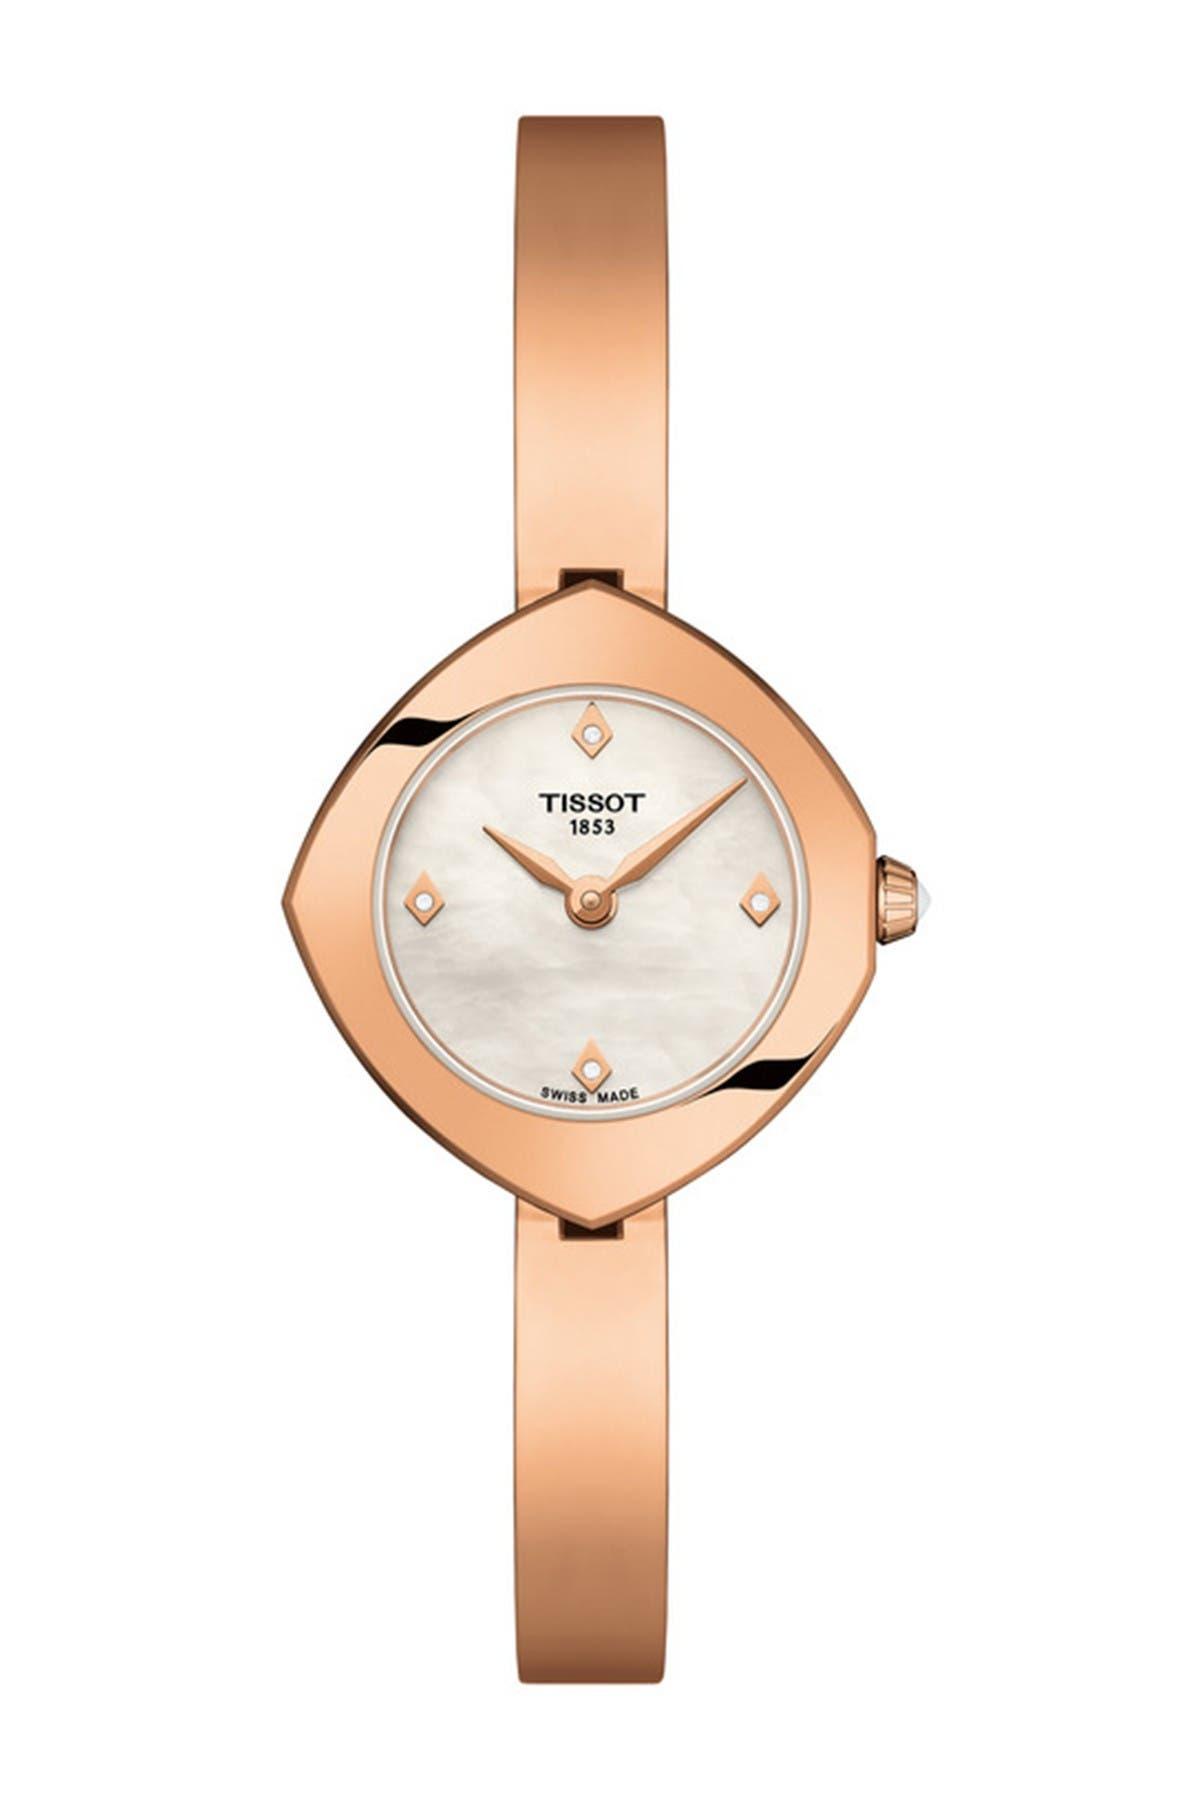 Image of Tissot Women's Femini-T Mother of Pearl & Diamond Bangle Watch, 23mm - 0.01 CTW